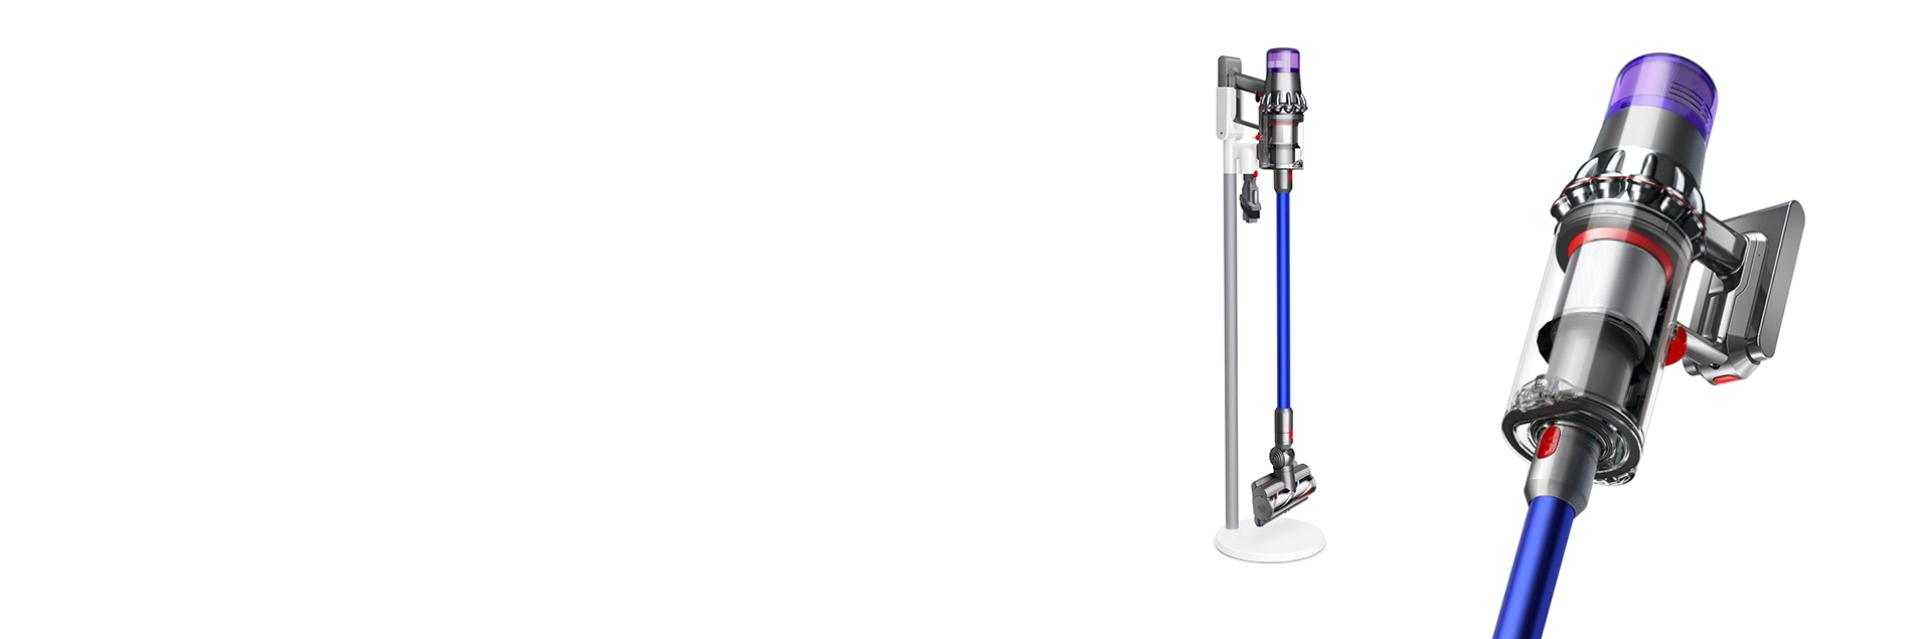 Dyson V11 machine mounted on floor dok